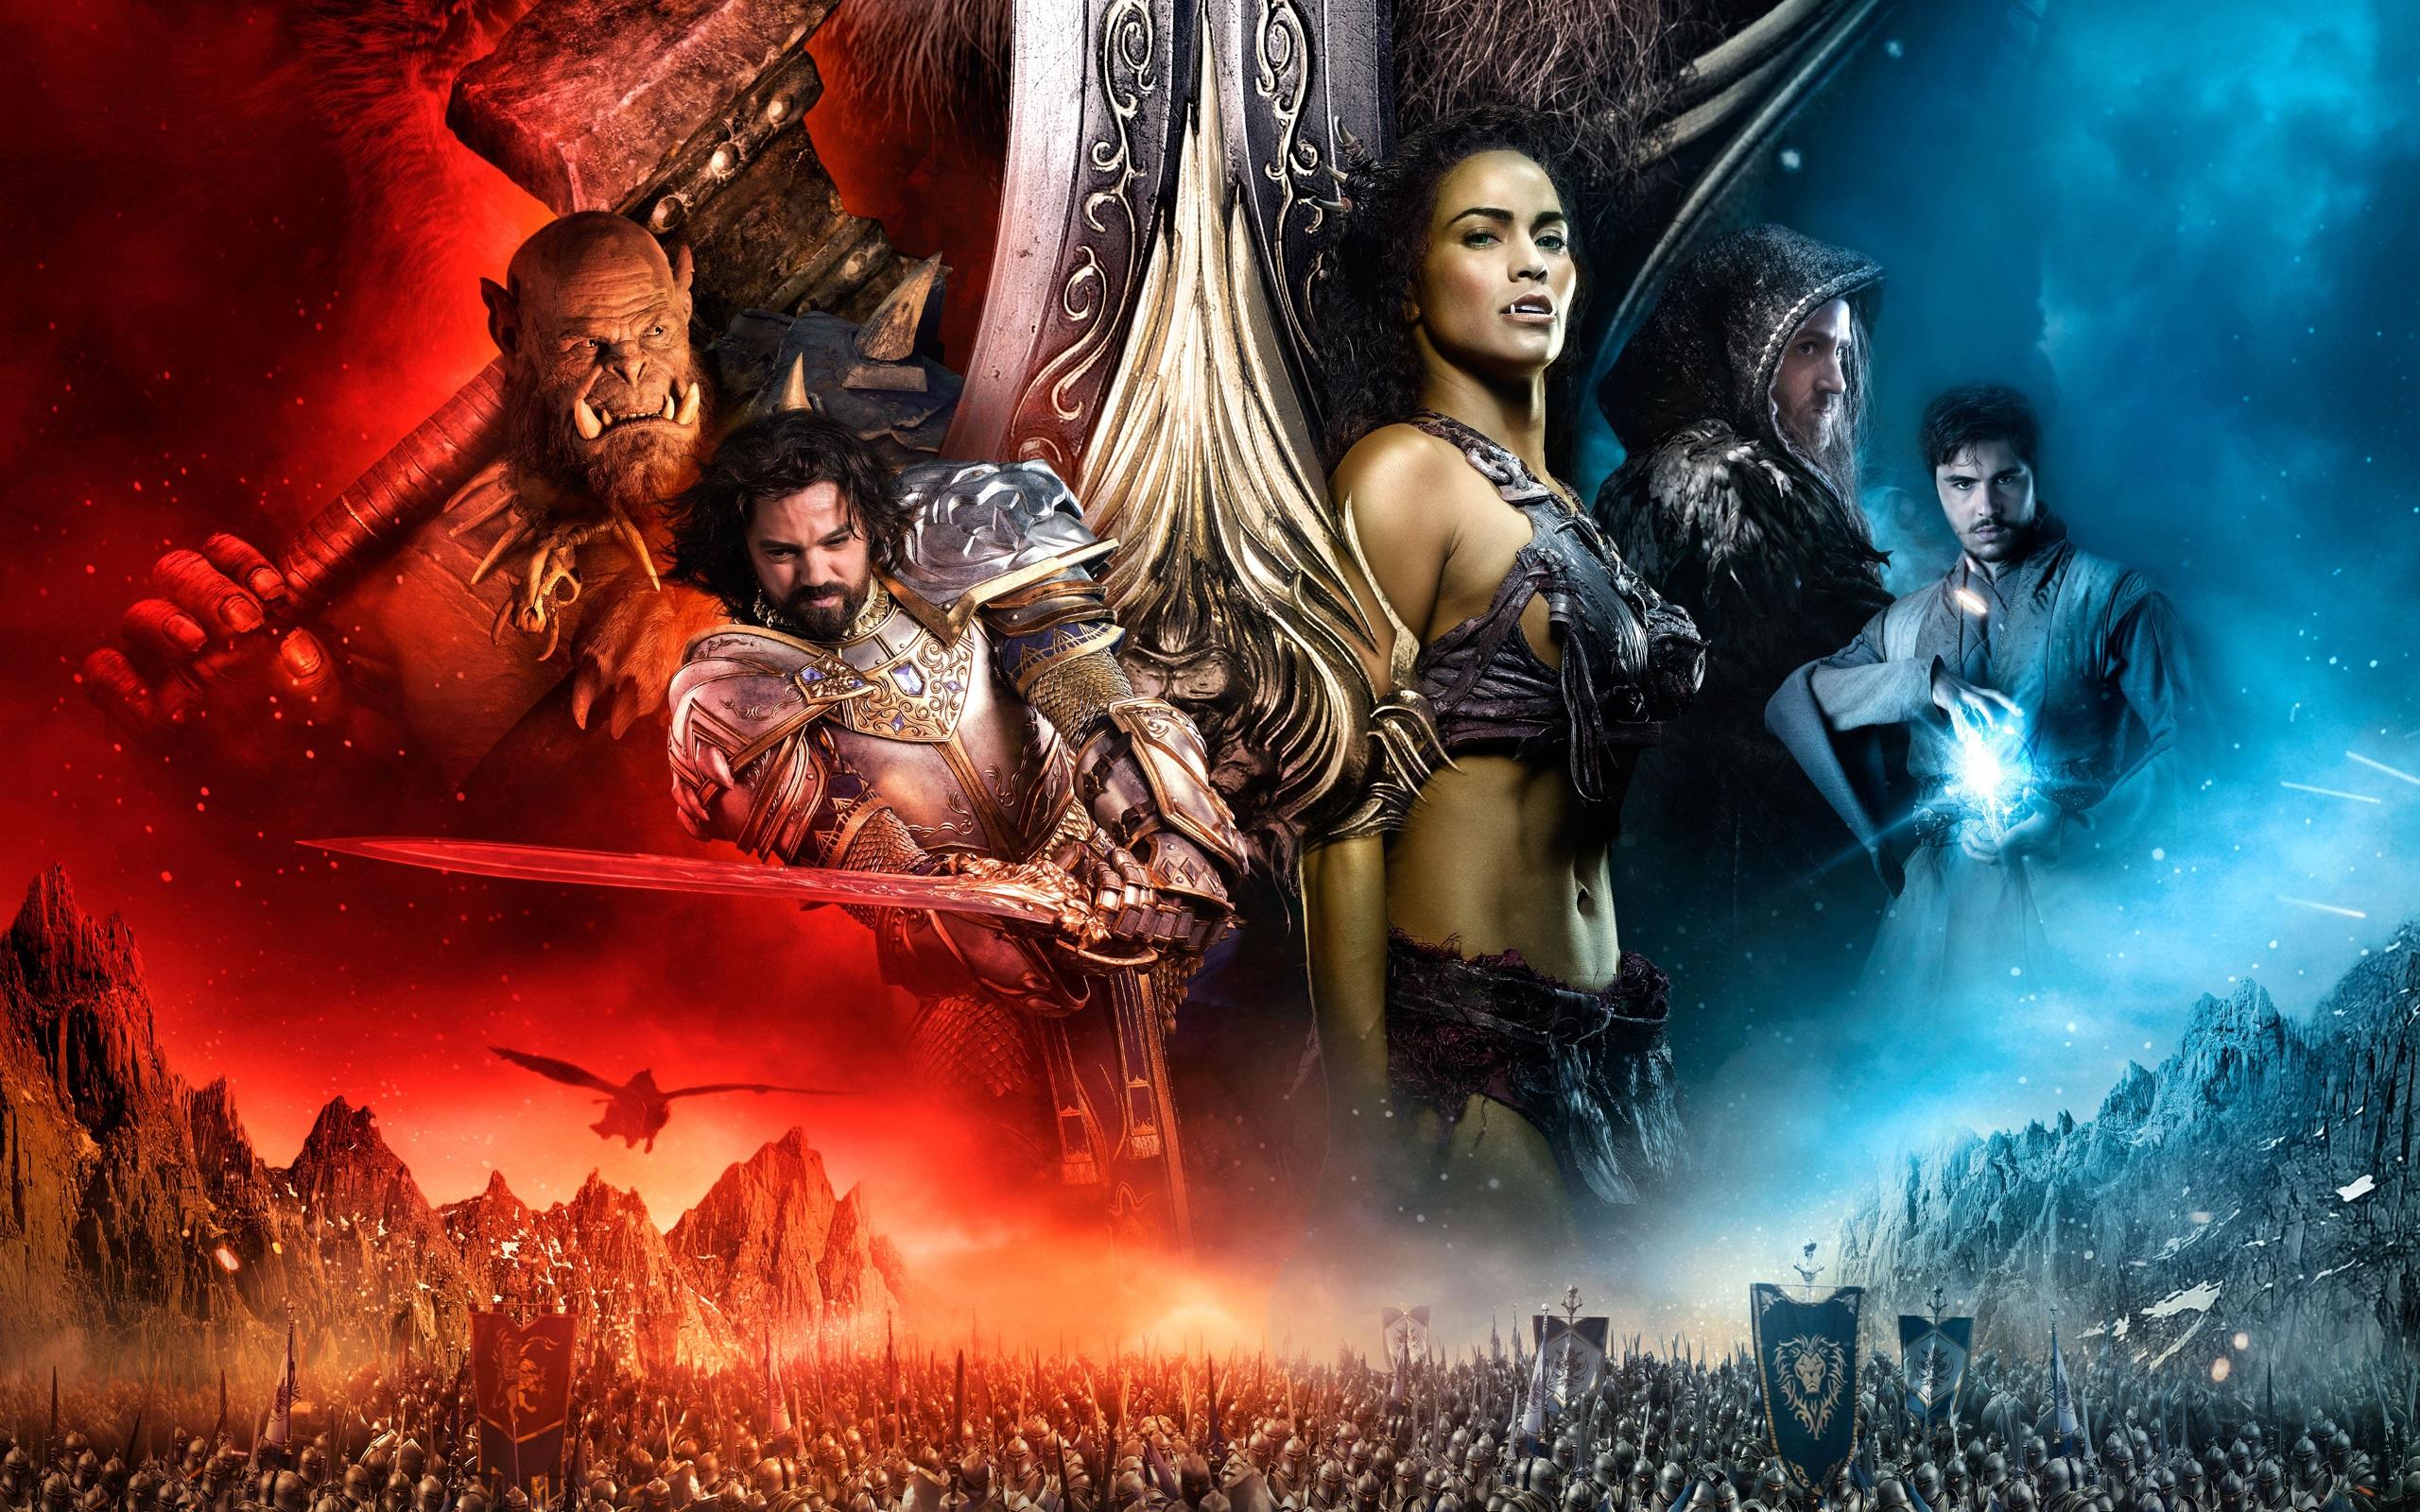 Warcraft 2016 Movie 750x1334 Iphone 8766s Wallpaper